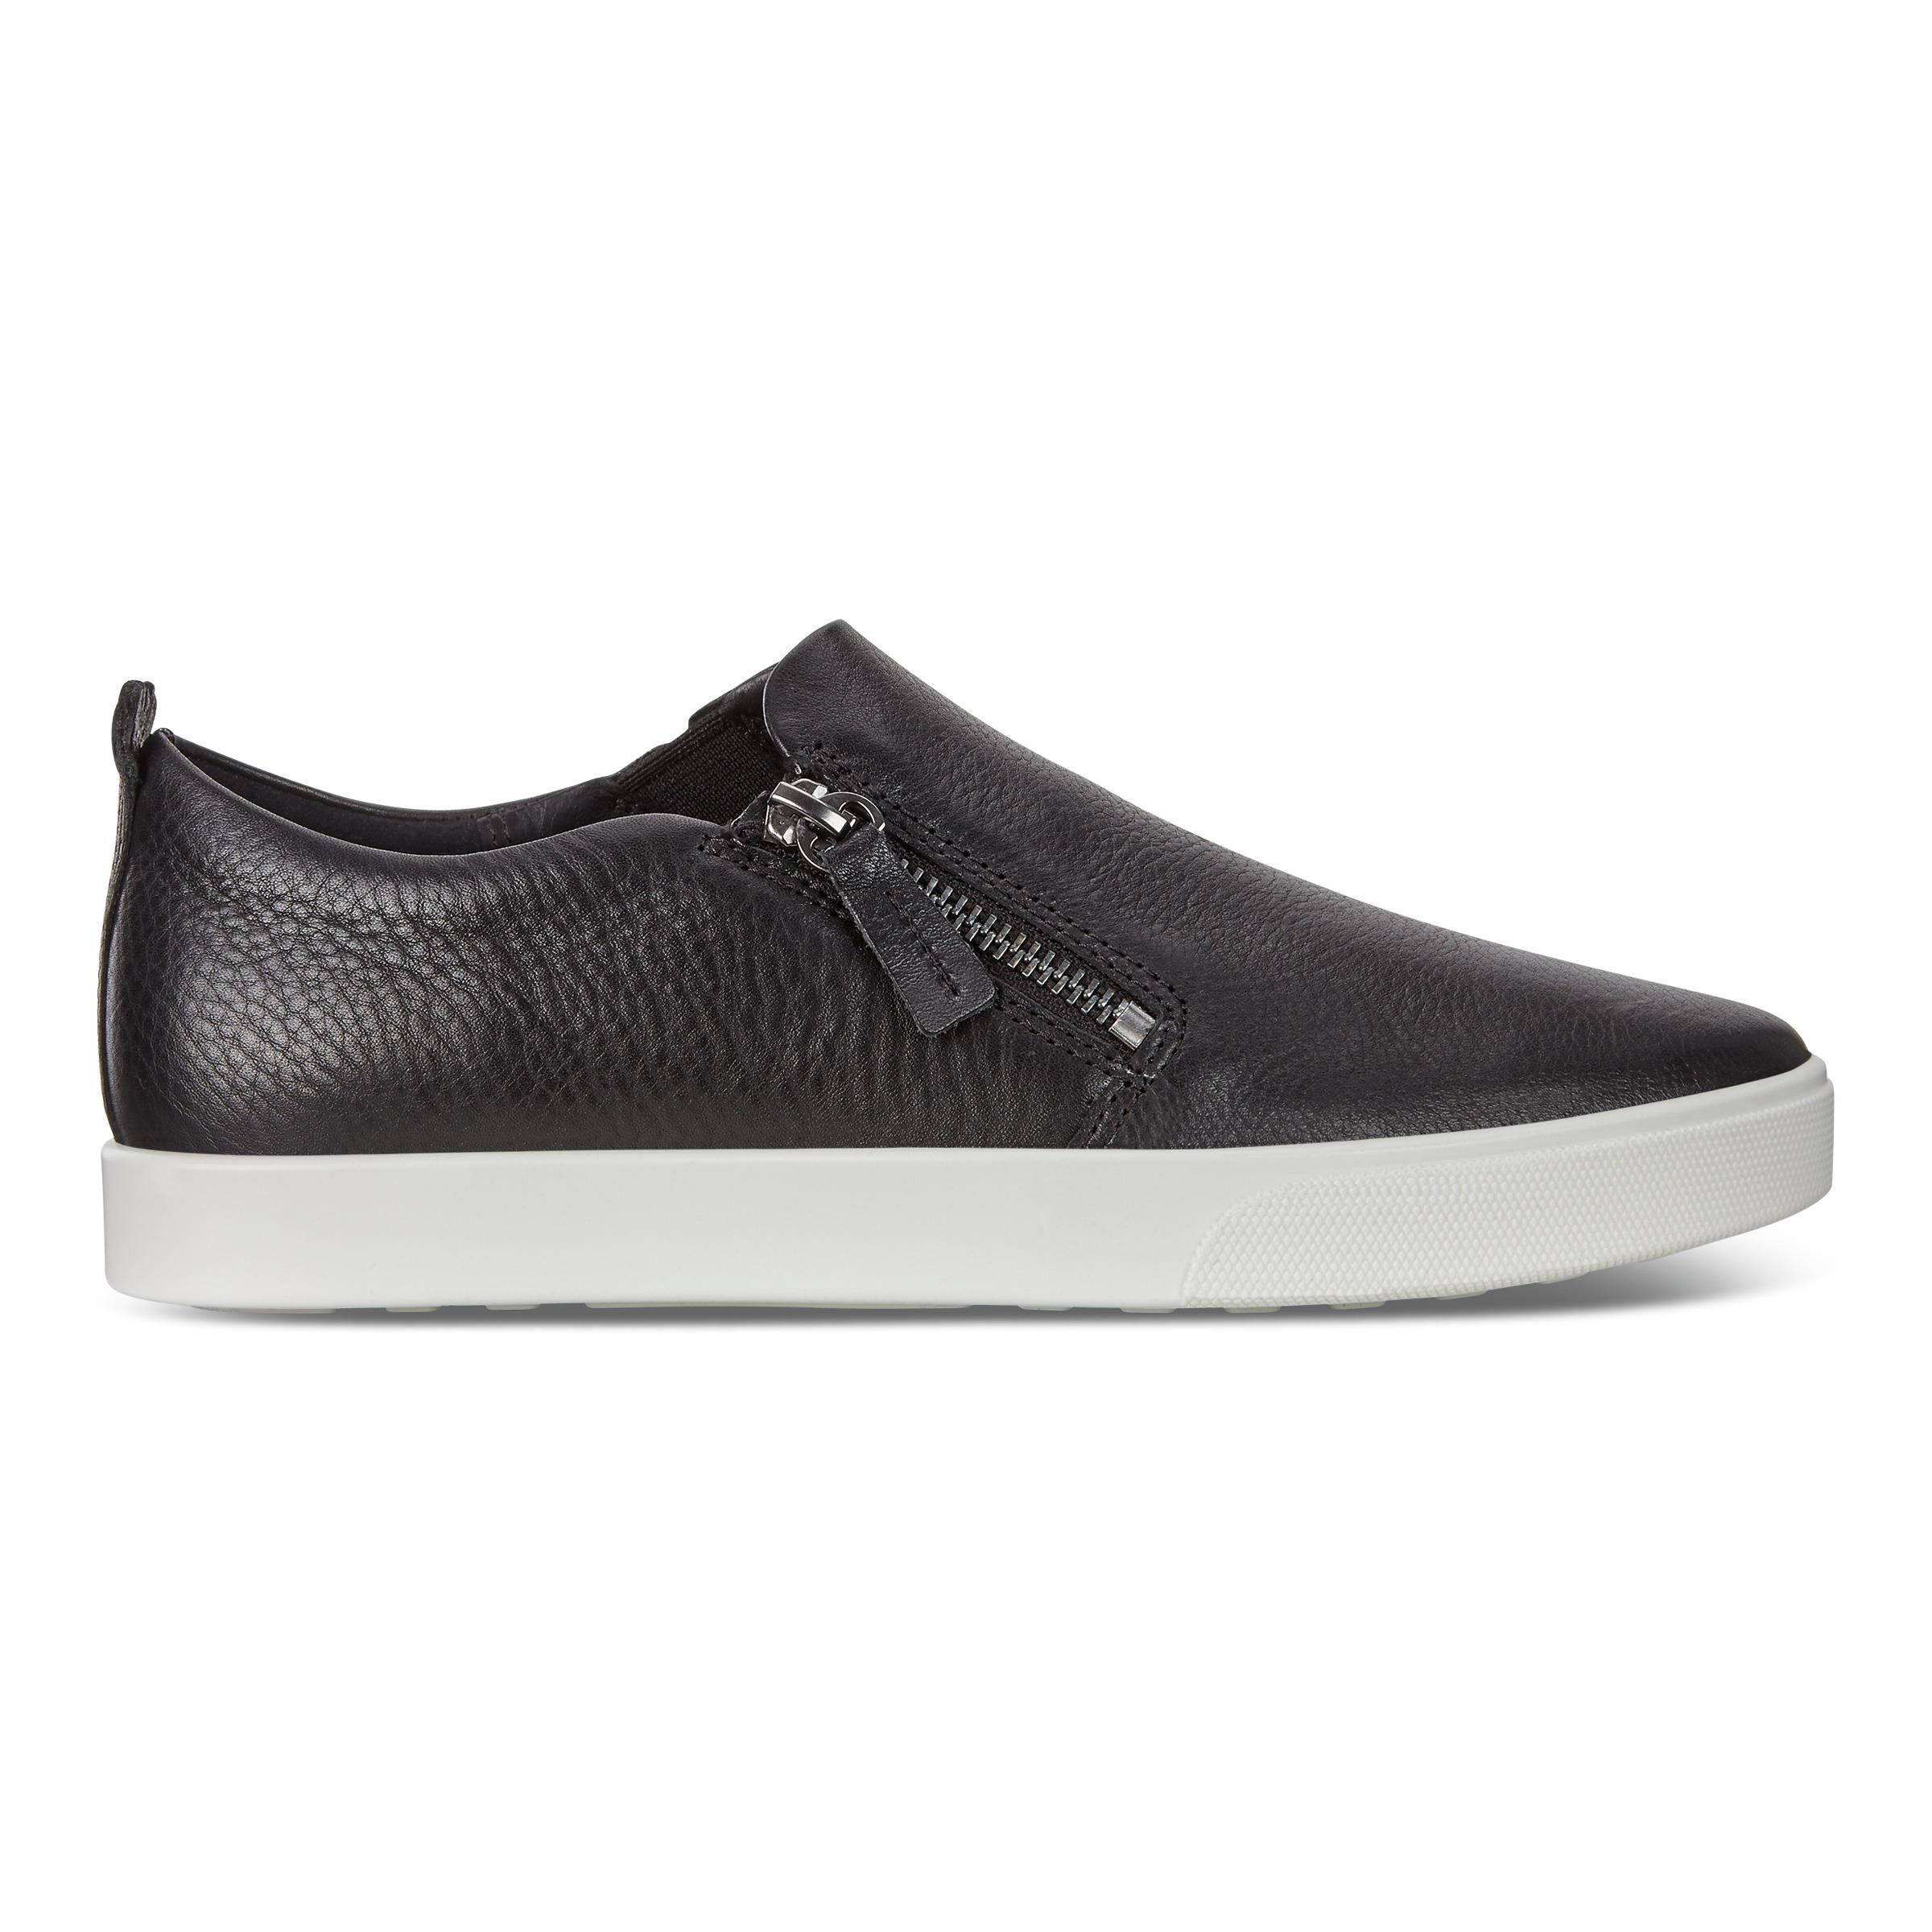 ECCO Gillian Shoe Sneakers Size 8-8.5 Black